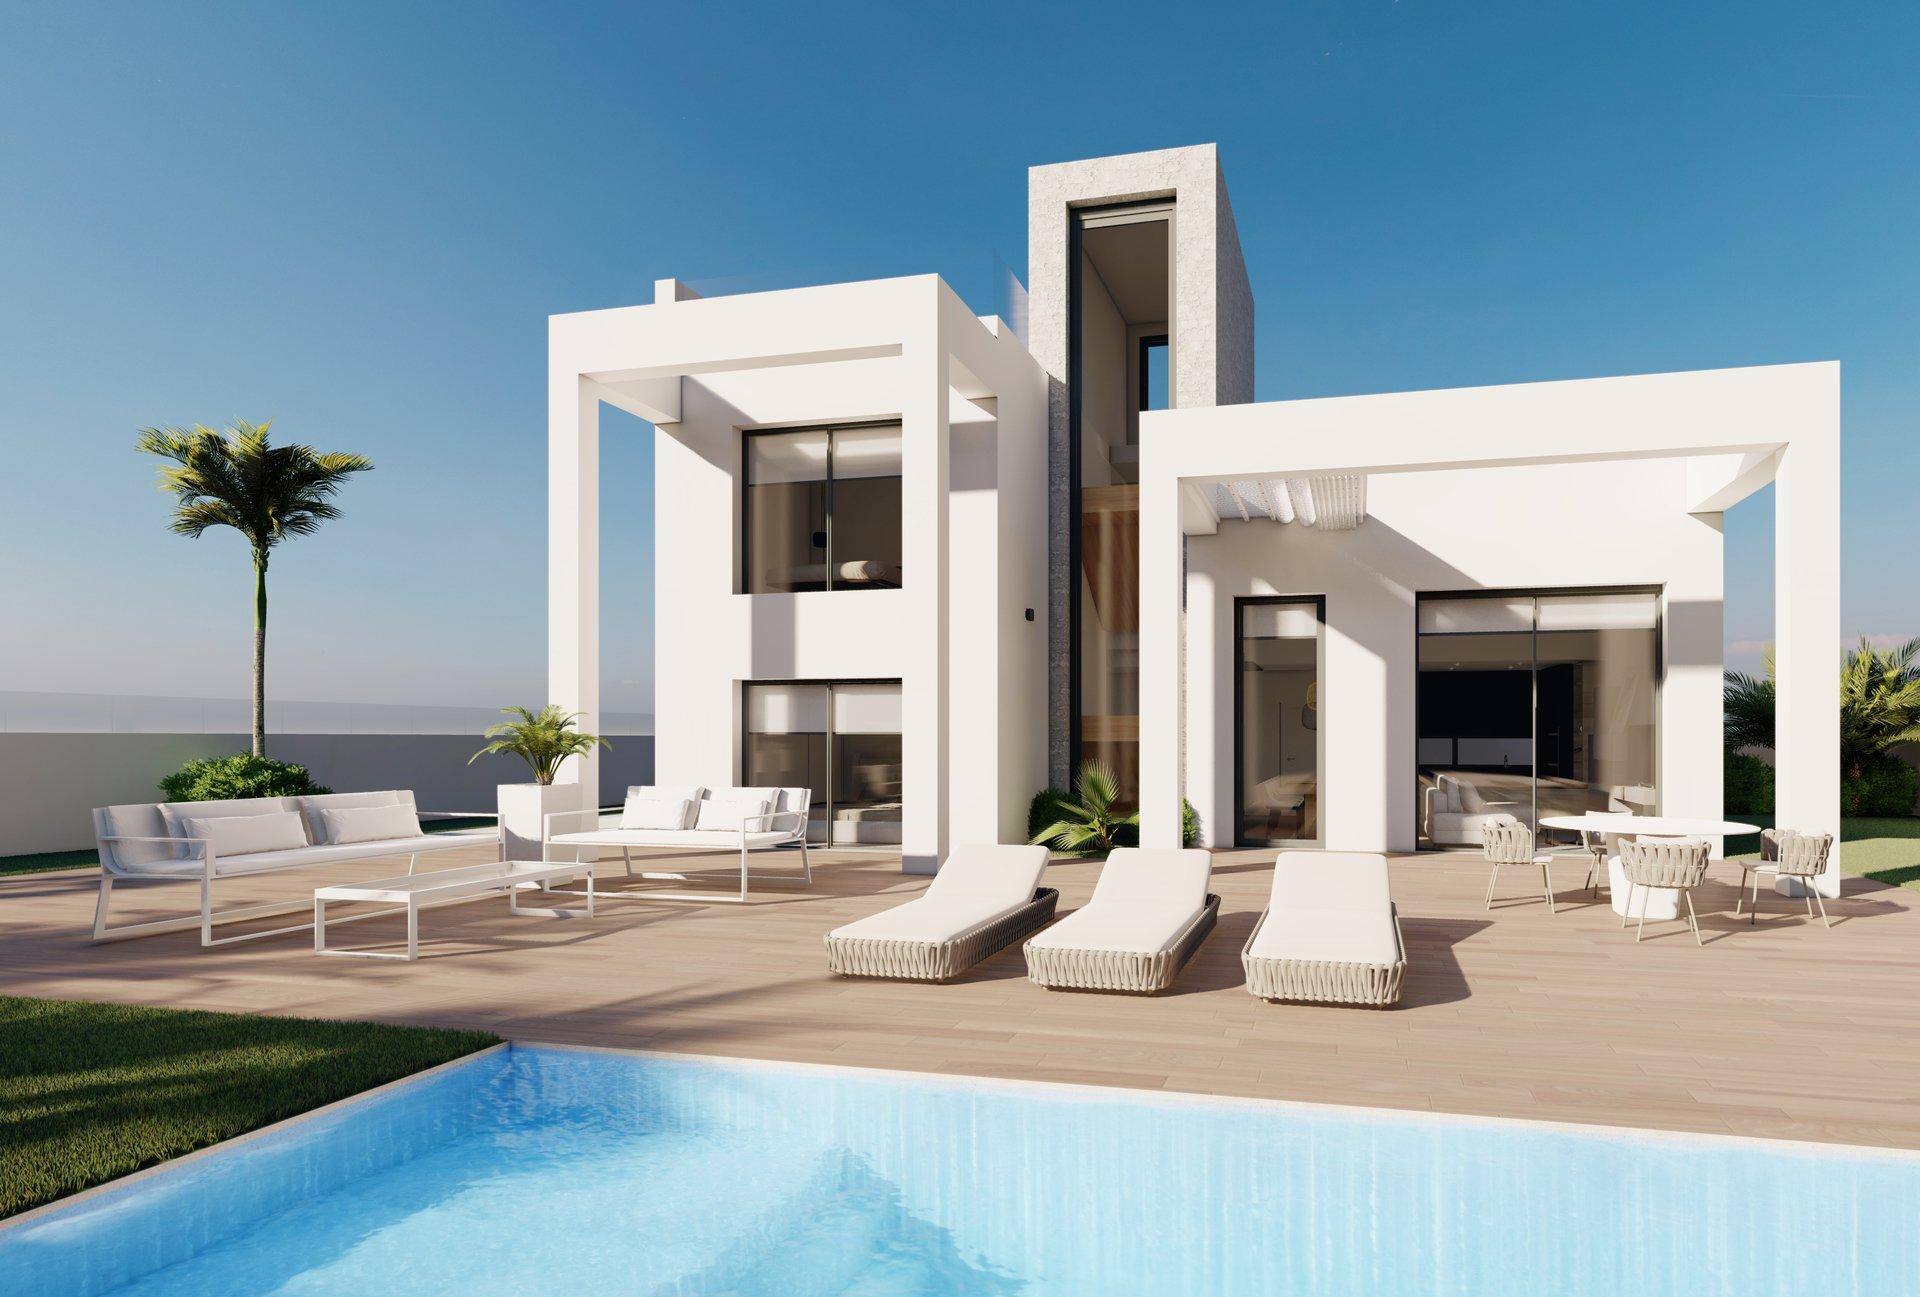 SPAIN COSTA BLANCA – Benidorm, luxury chalets with spectacular sea views